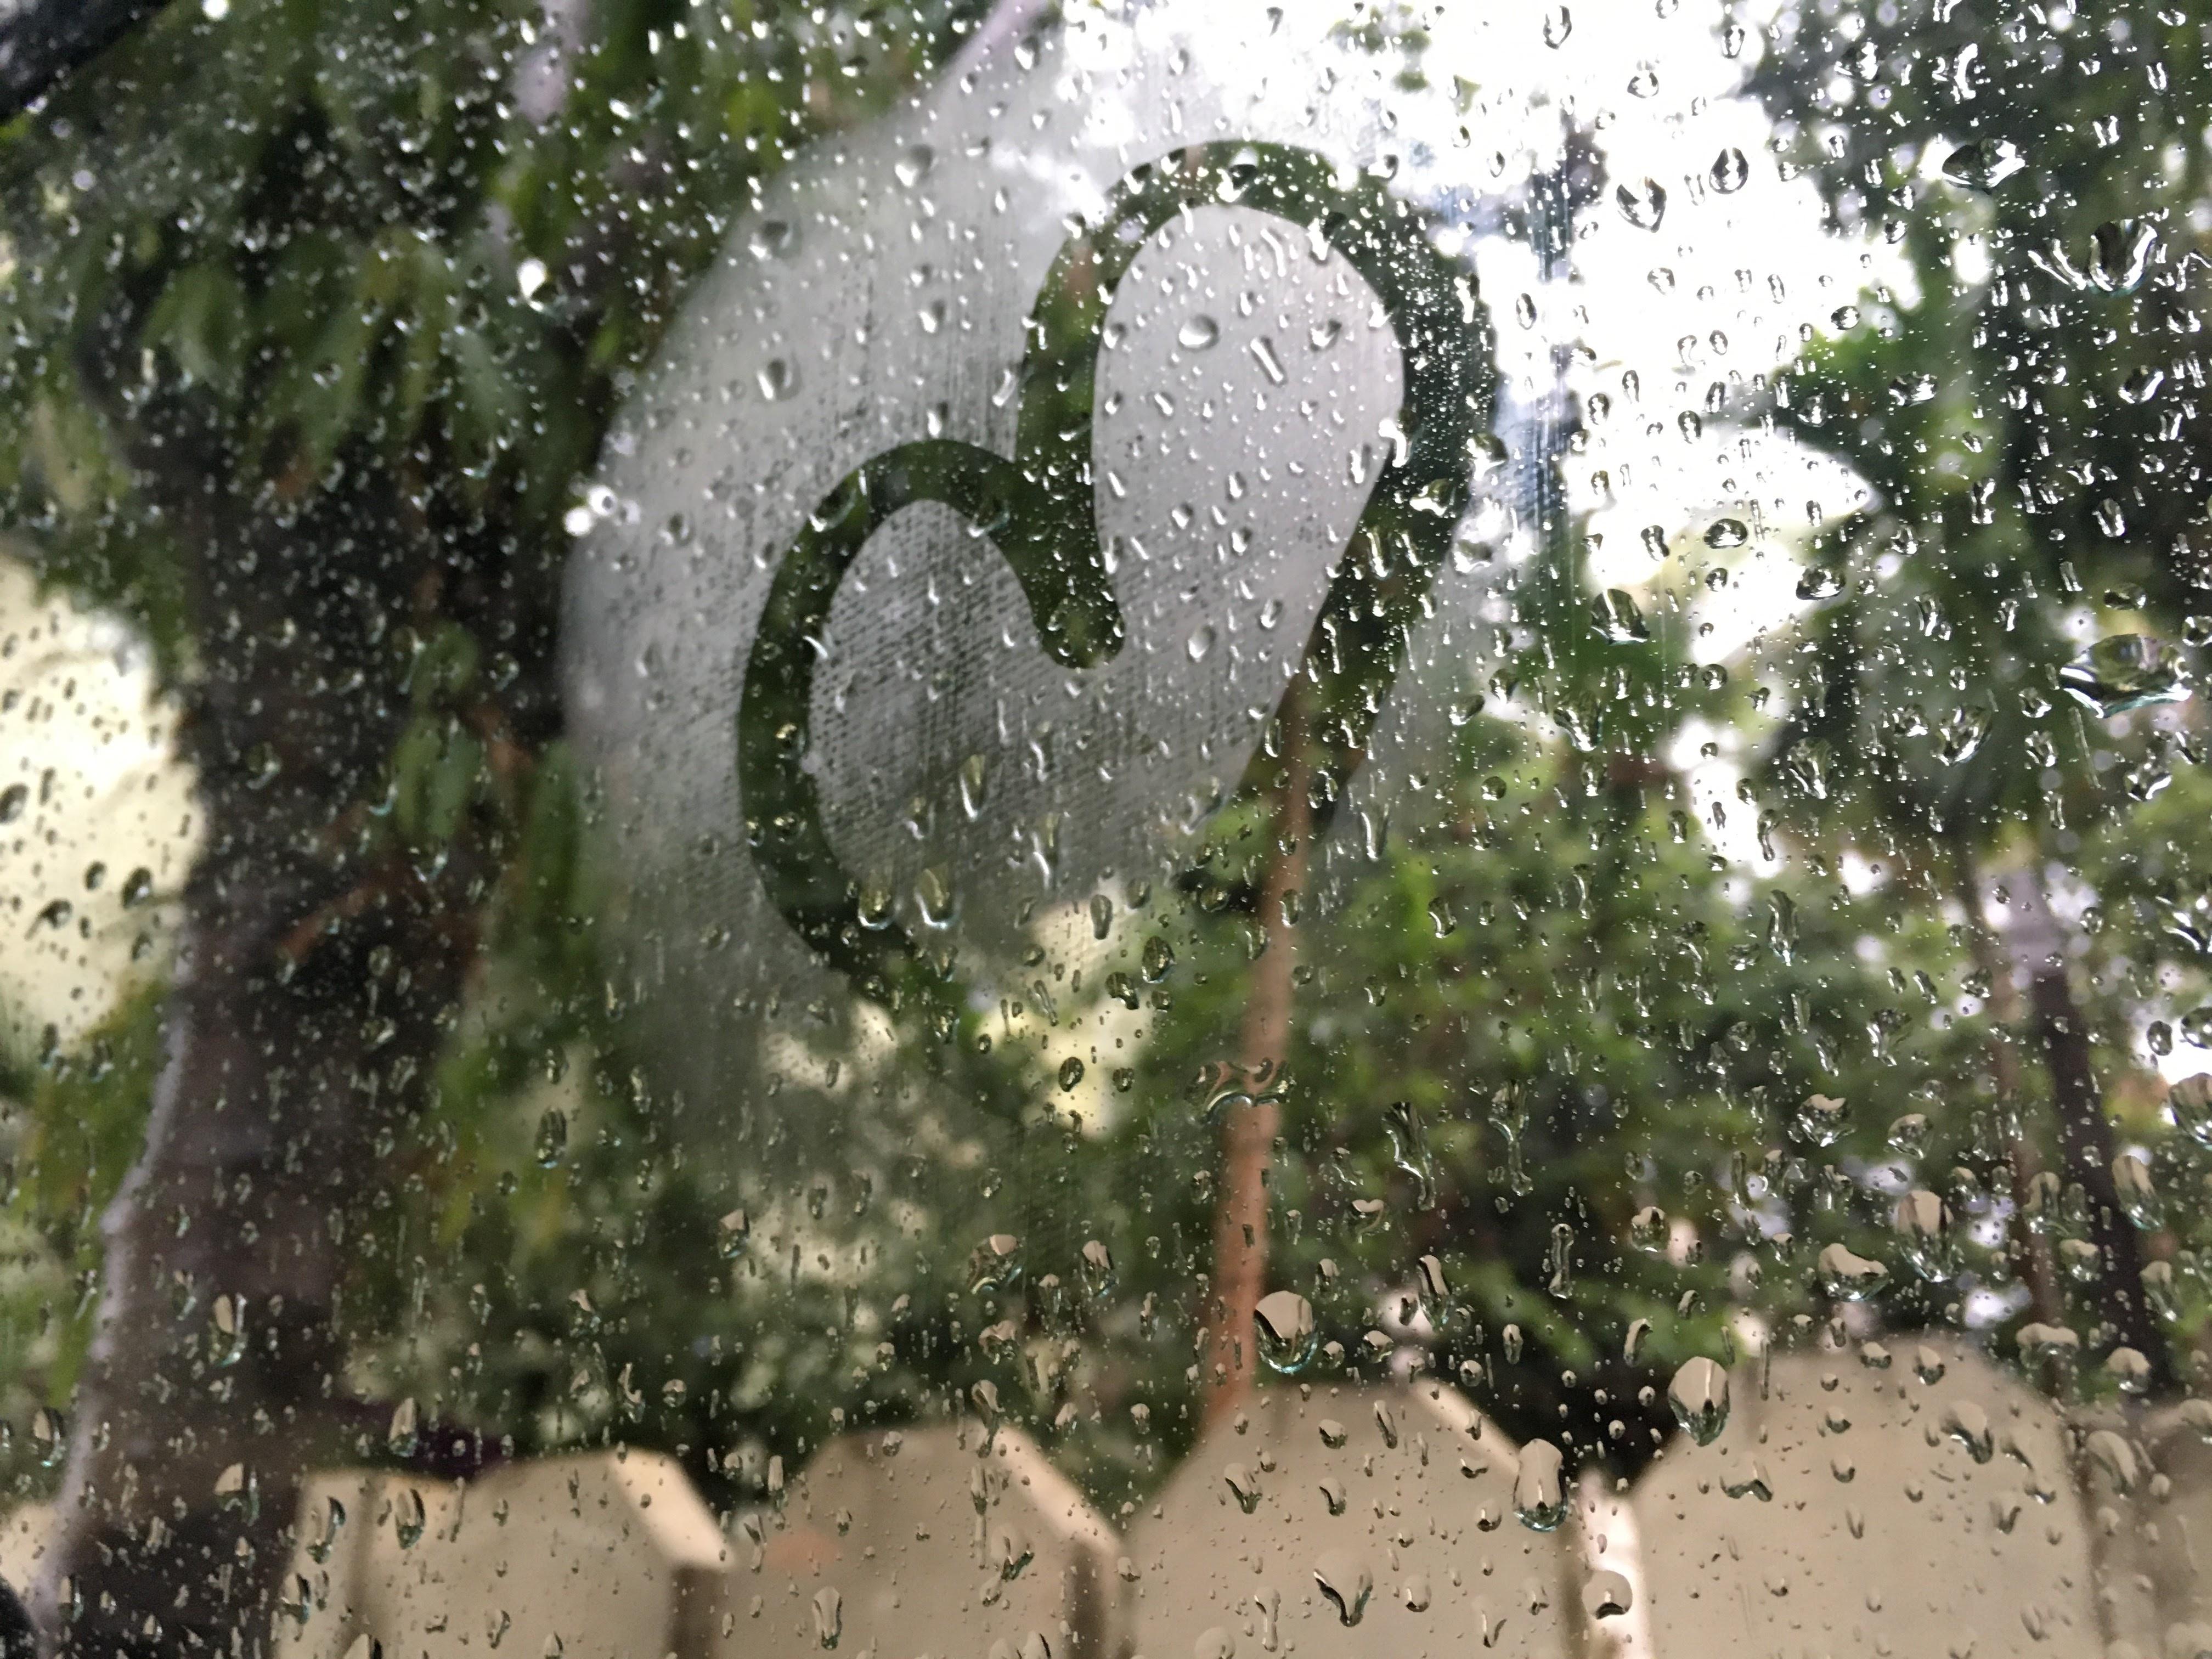 Heart Symbol With Raindrops On Car Window